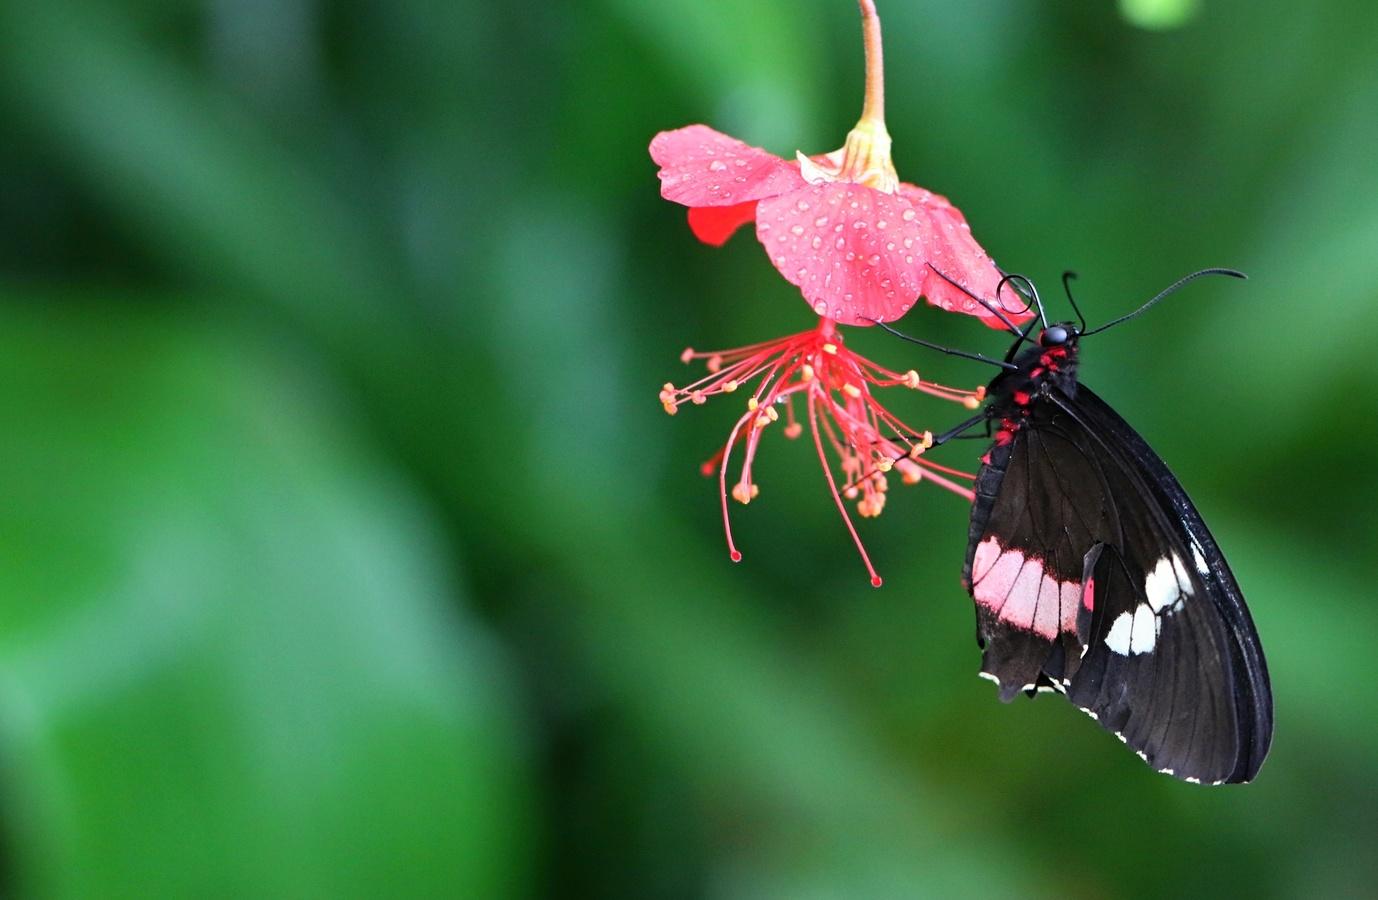 Motýlí nektar